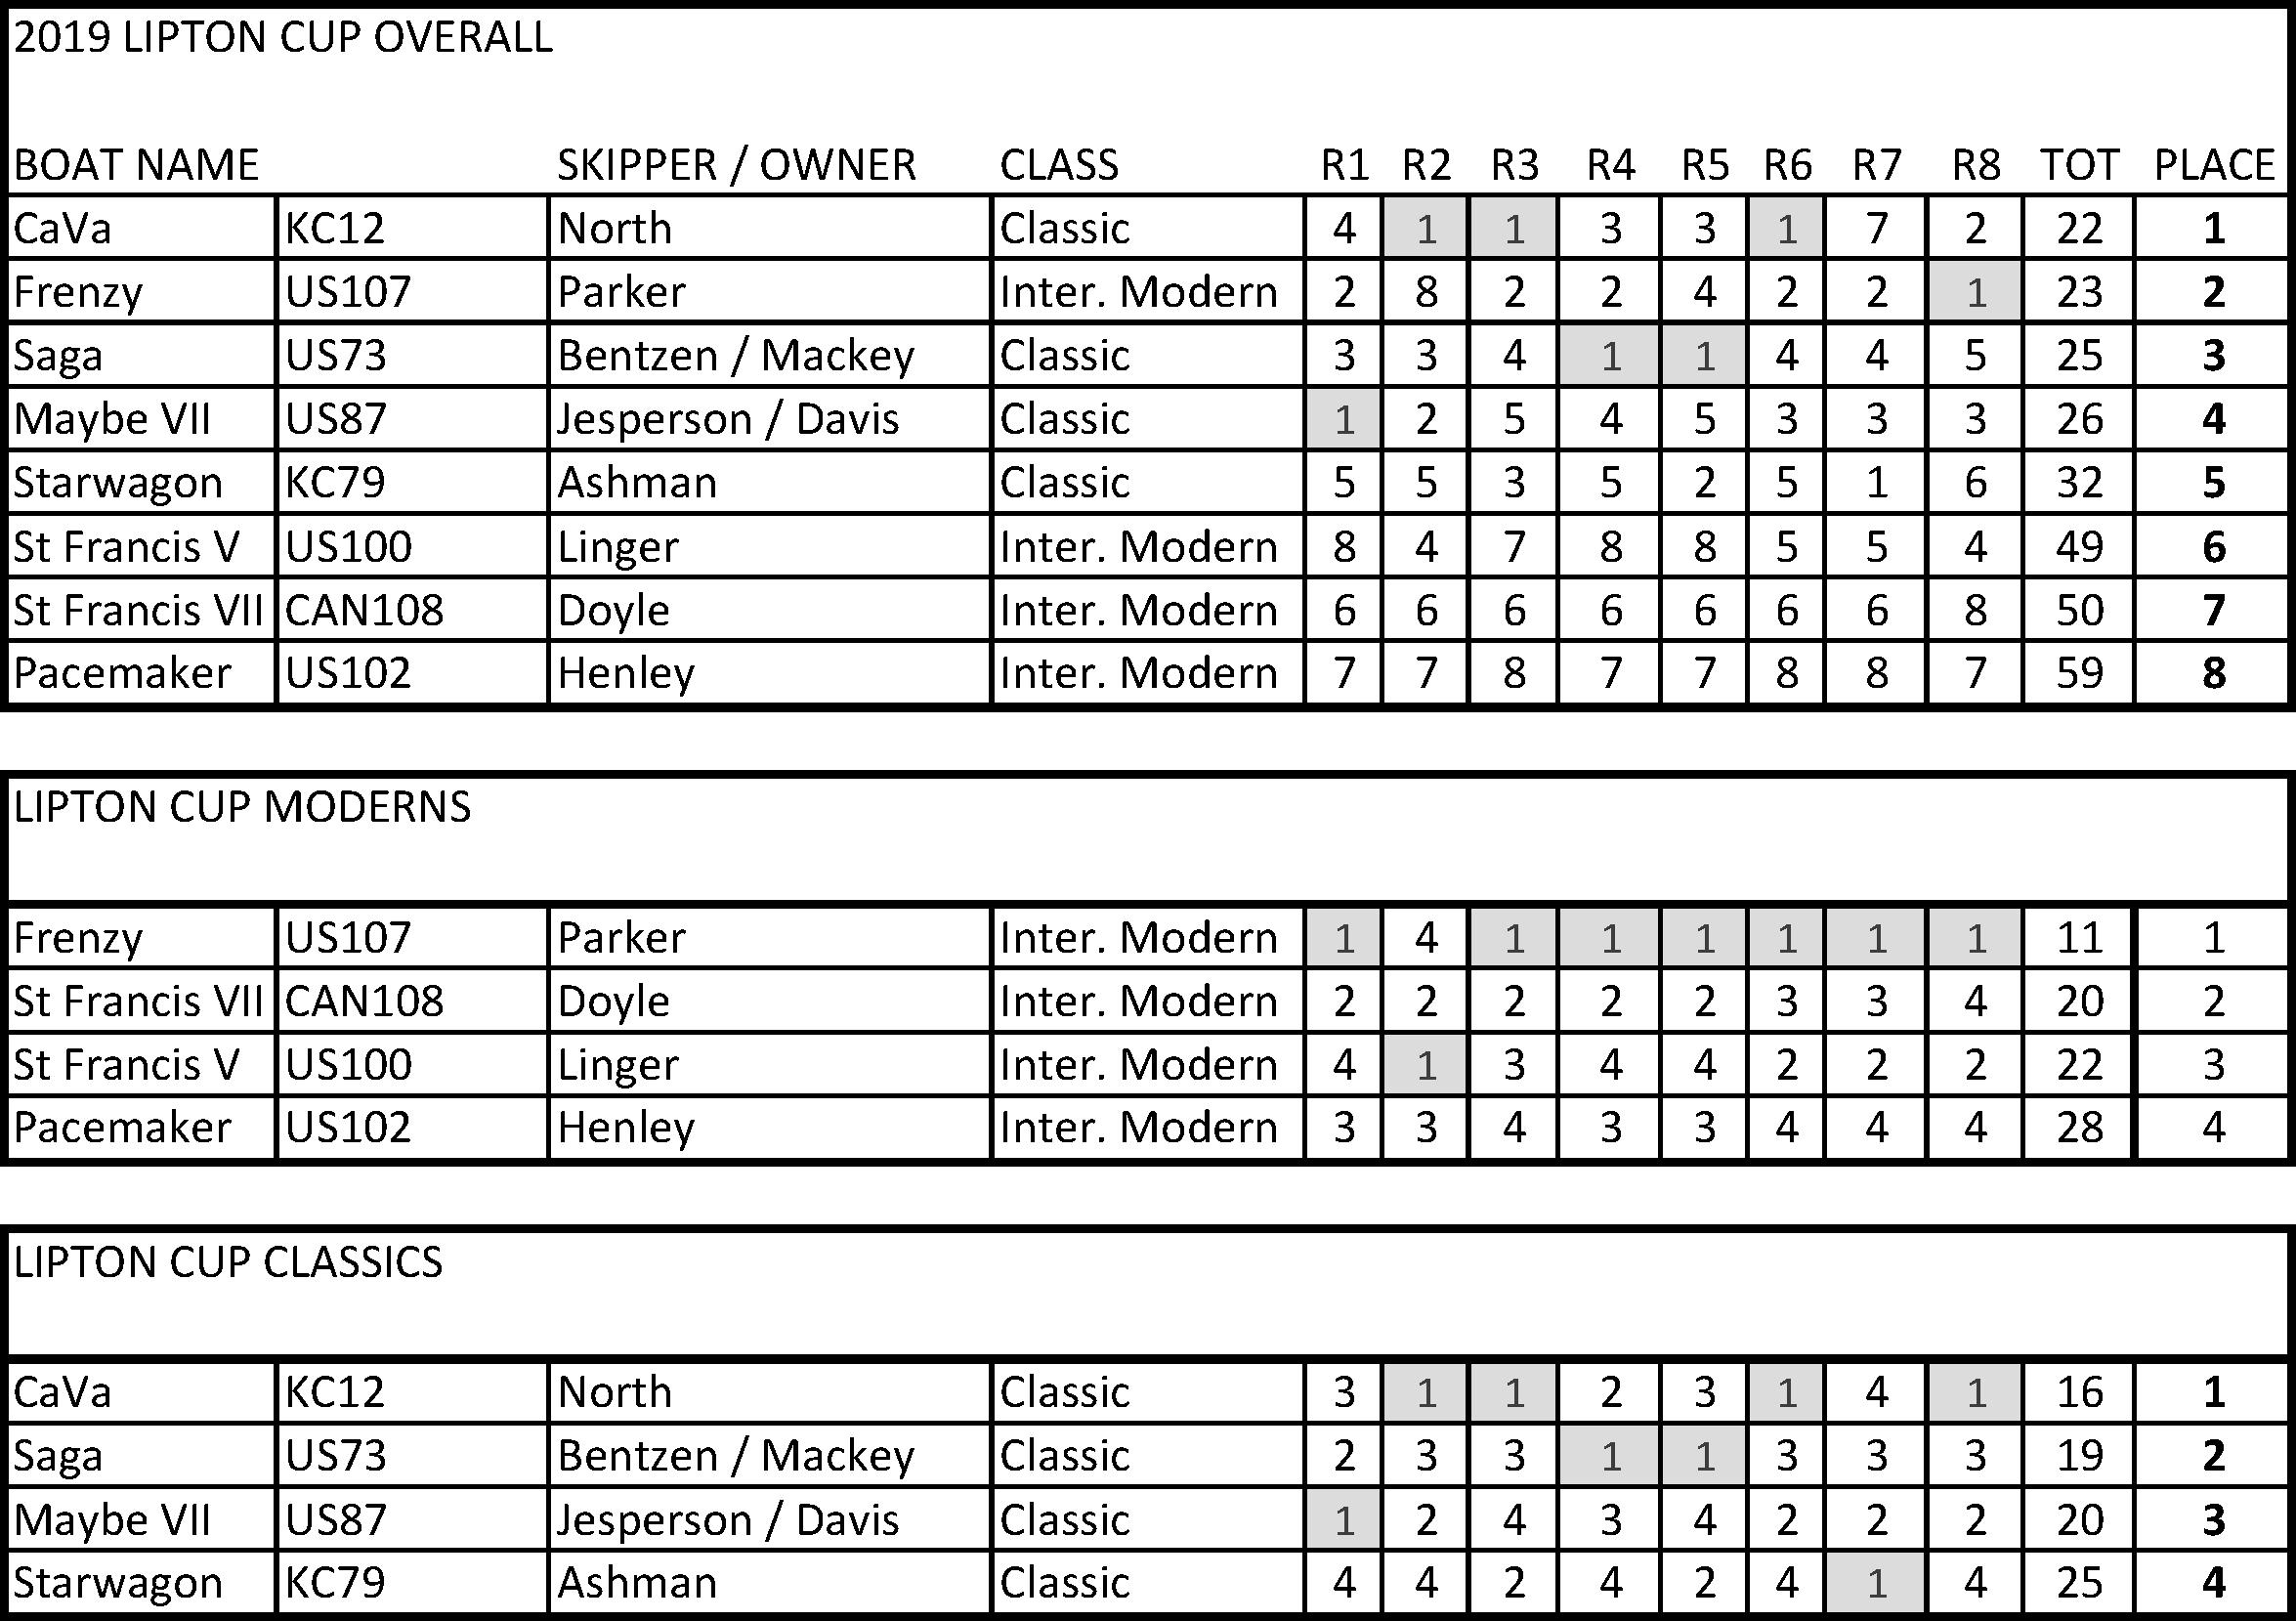 2019 Lipton Cup Results.jpg